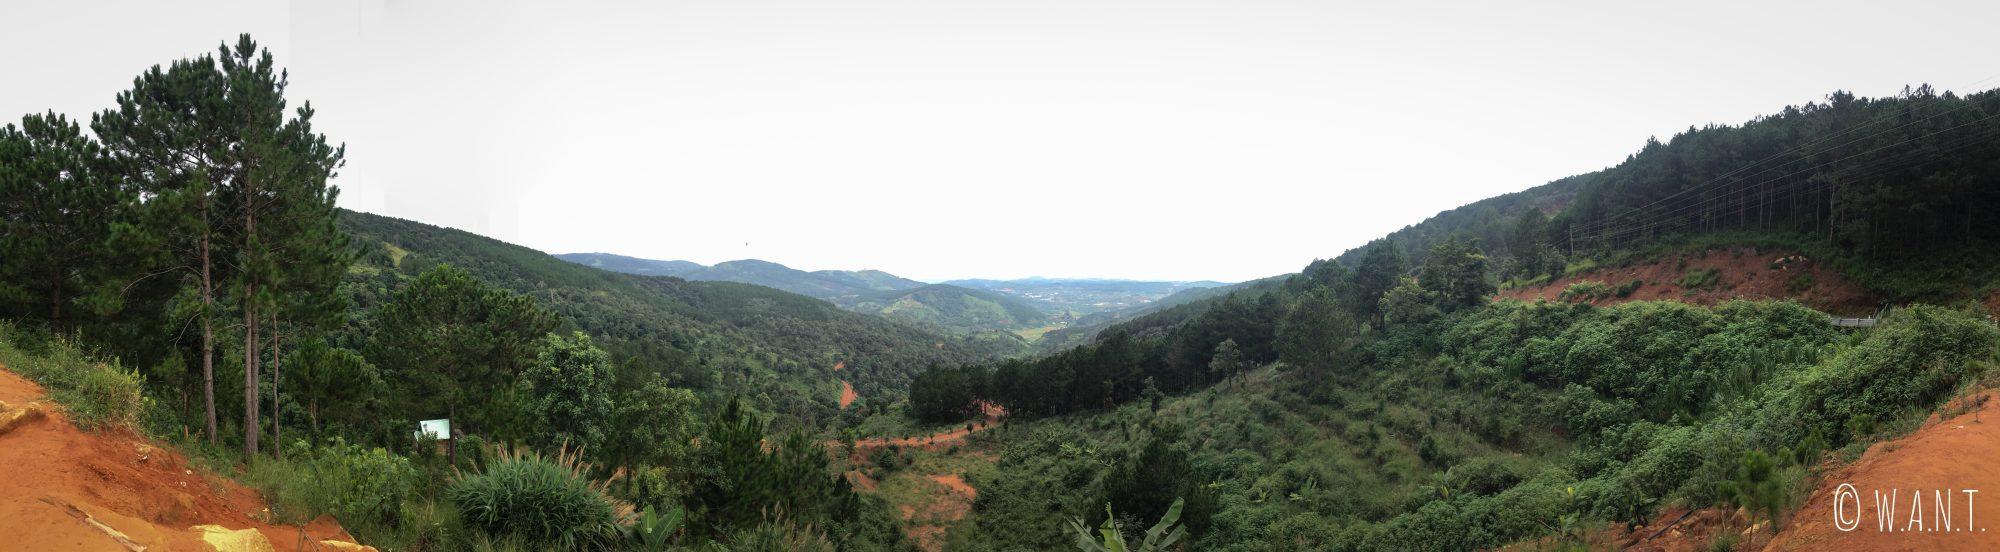 Panorama depuis la route 725 de Da Lat